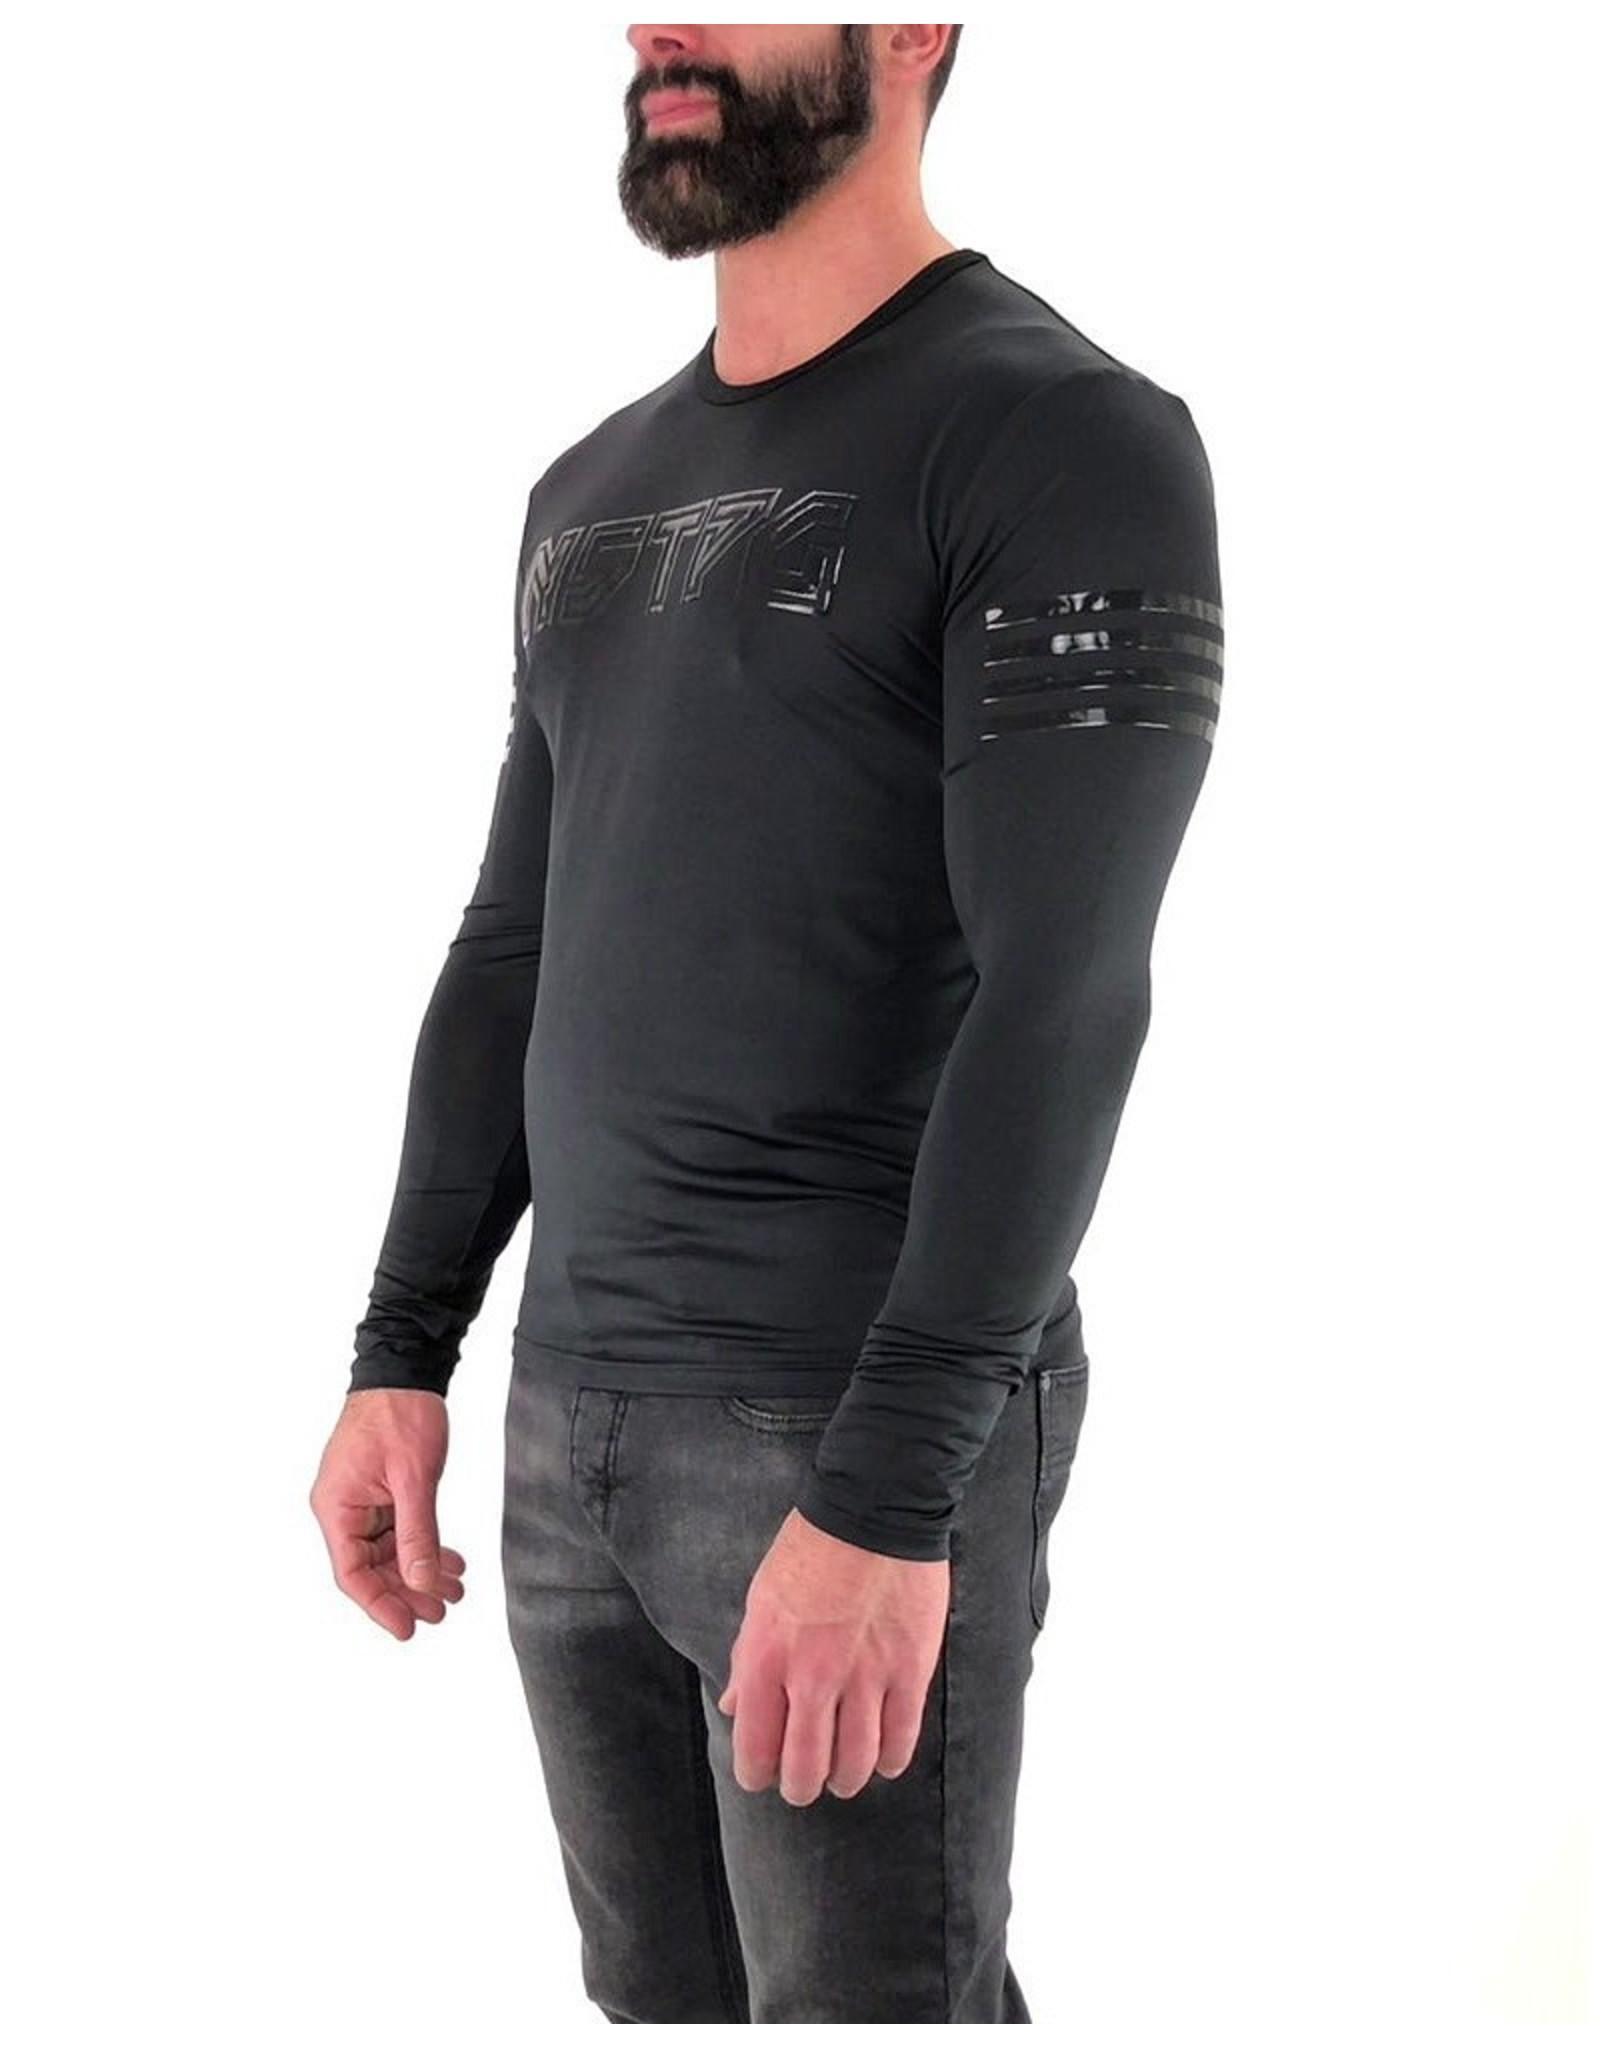 Nasty Pig Nasty Pig Patrol Long Sleeve Shirt